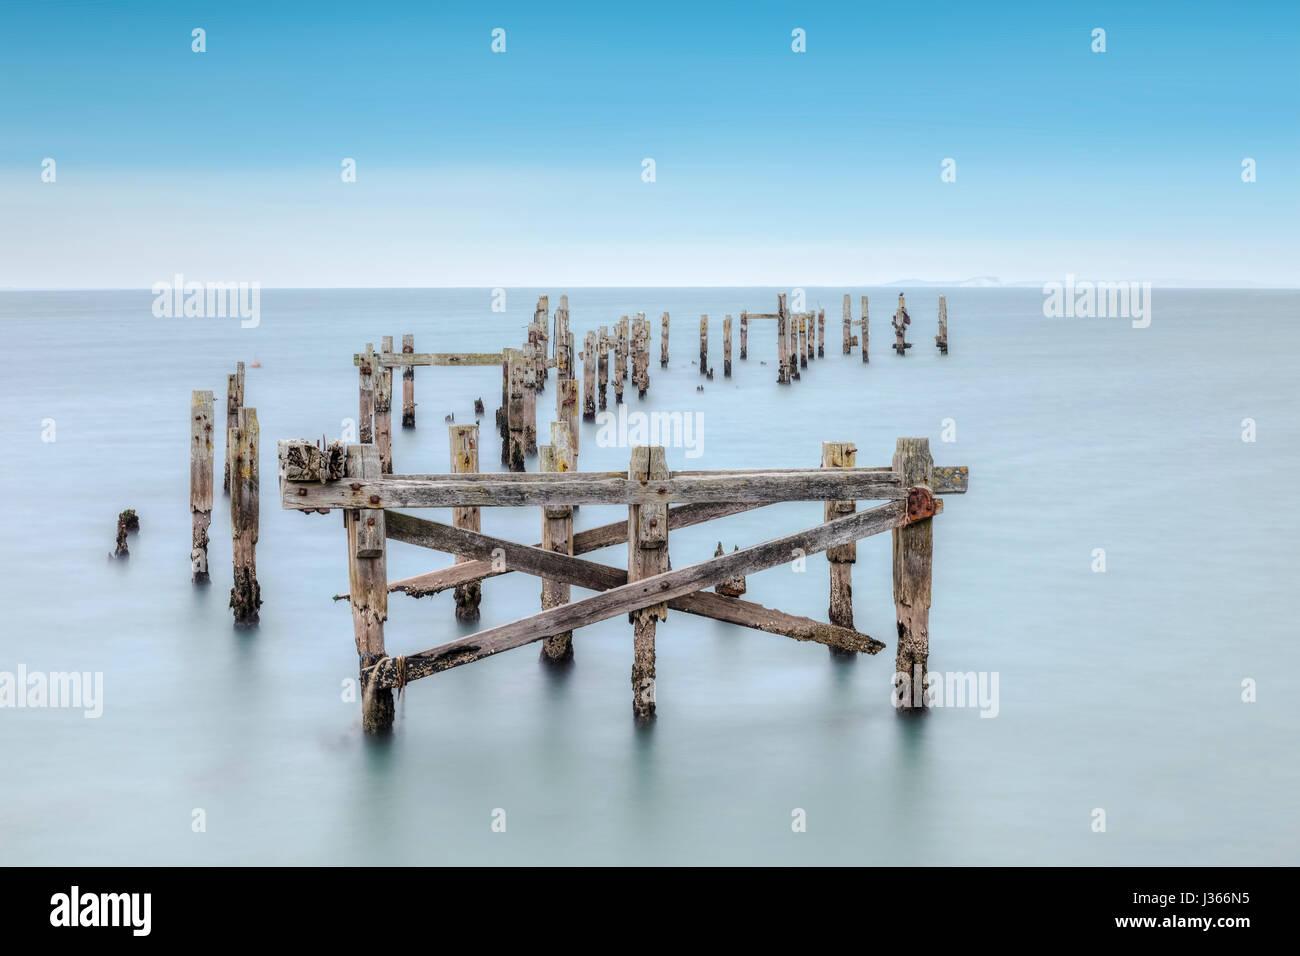 Swanage Pier, Purbeck, Dorset, England - Stock-Bilder